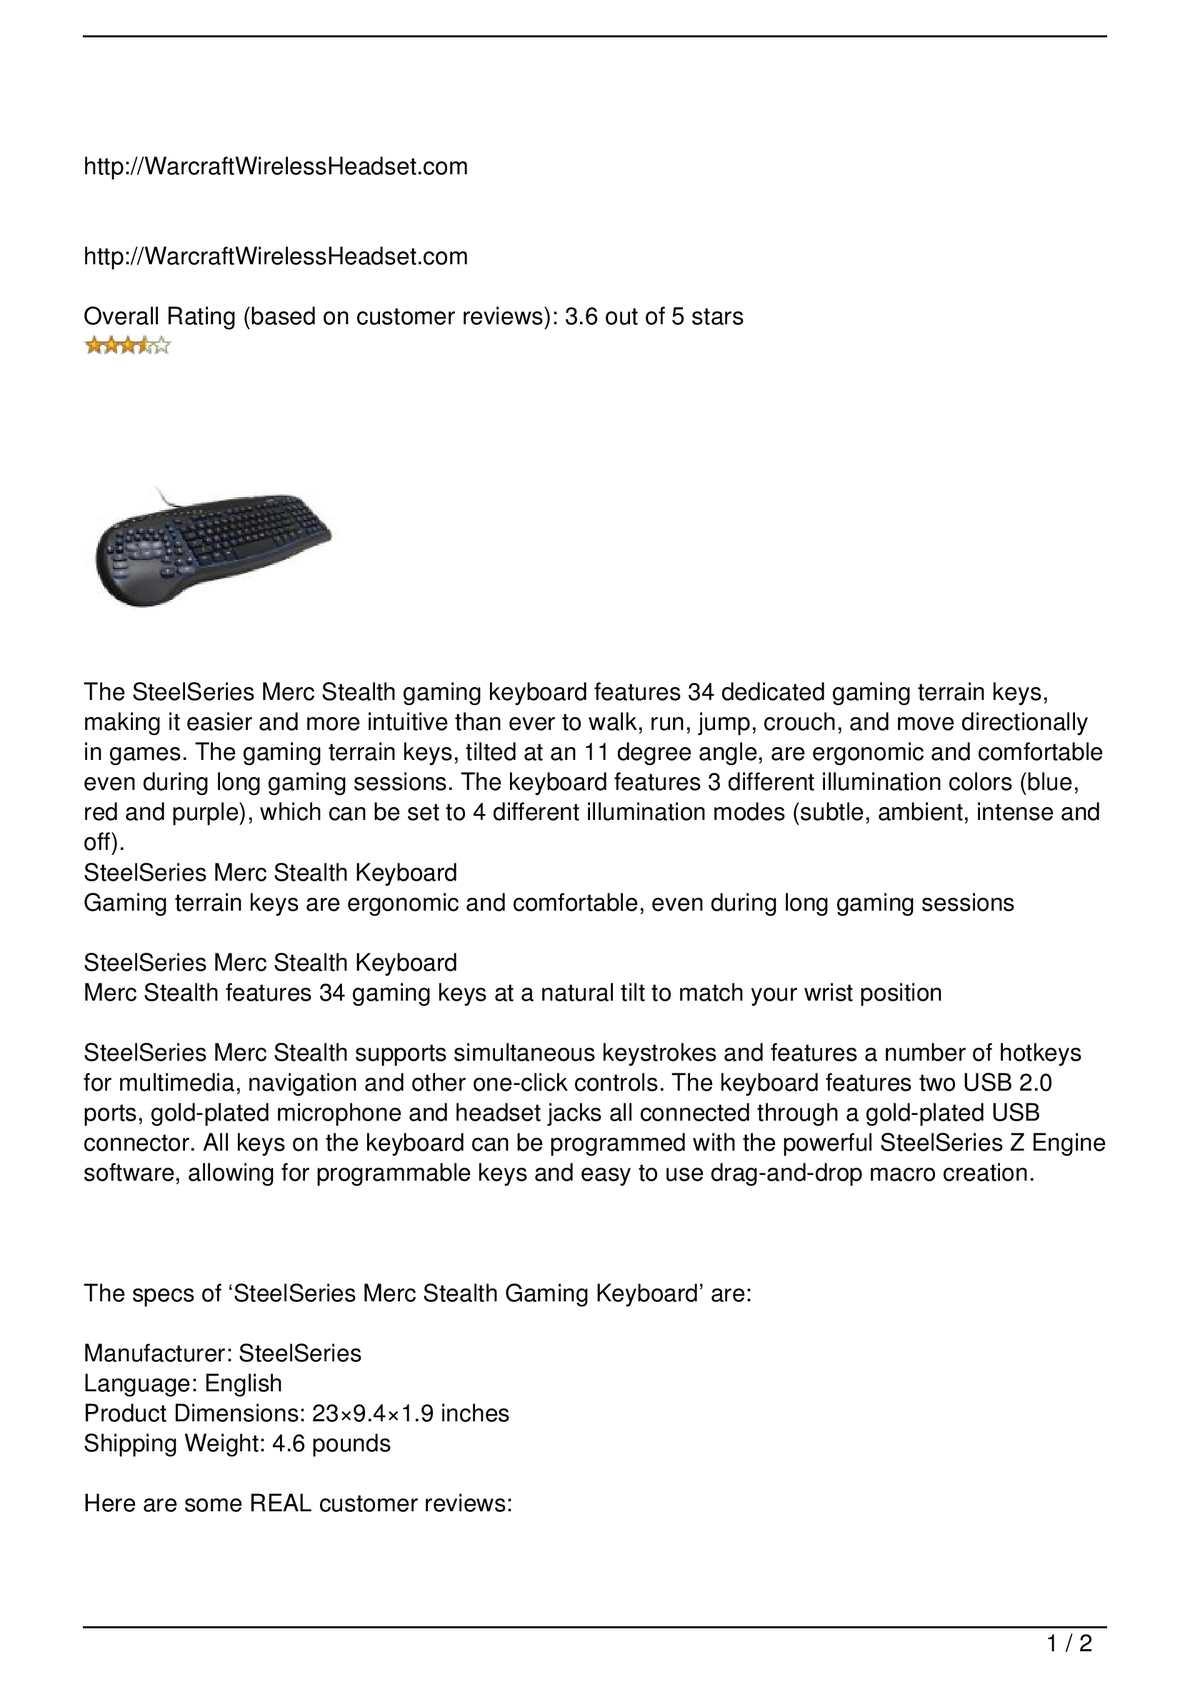 Calaméo - SteelSeries Merc Stealth Gaming Keyboard